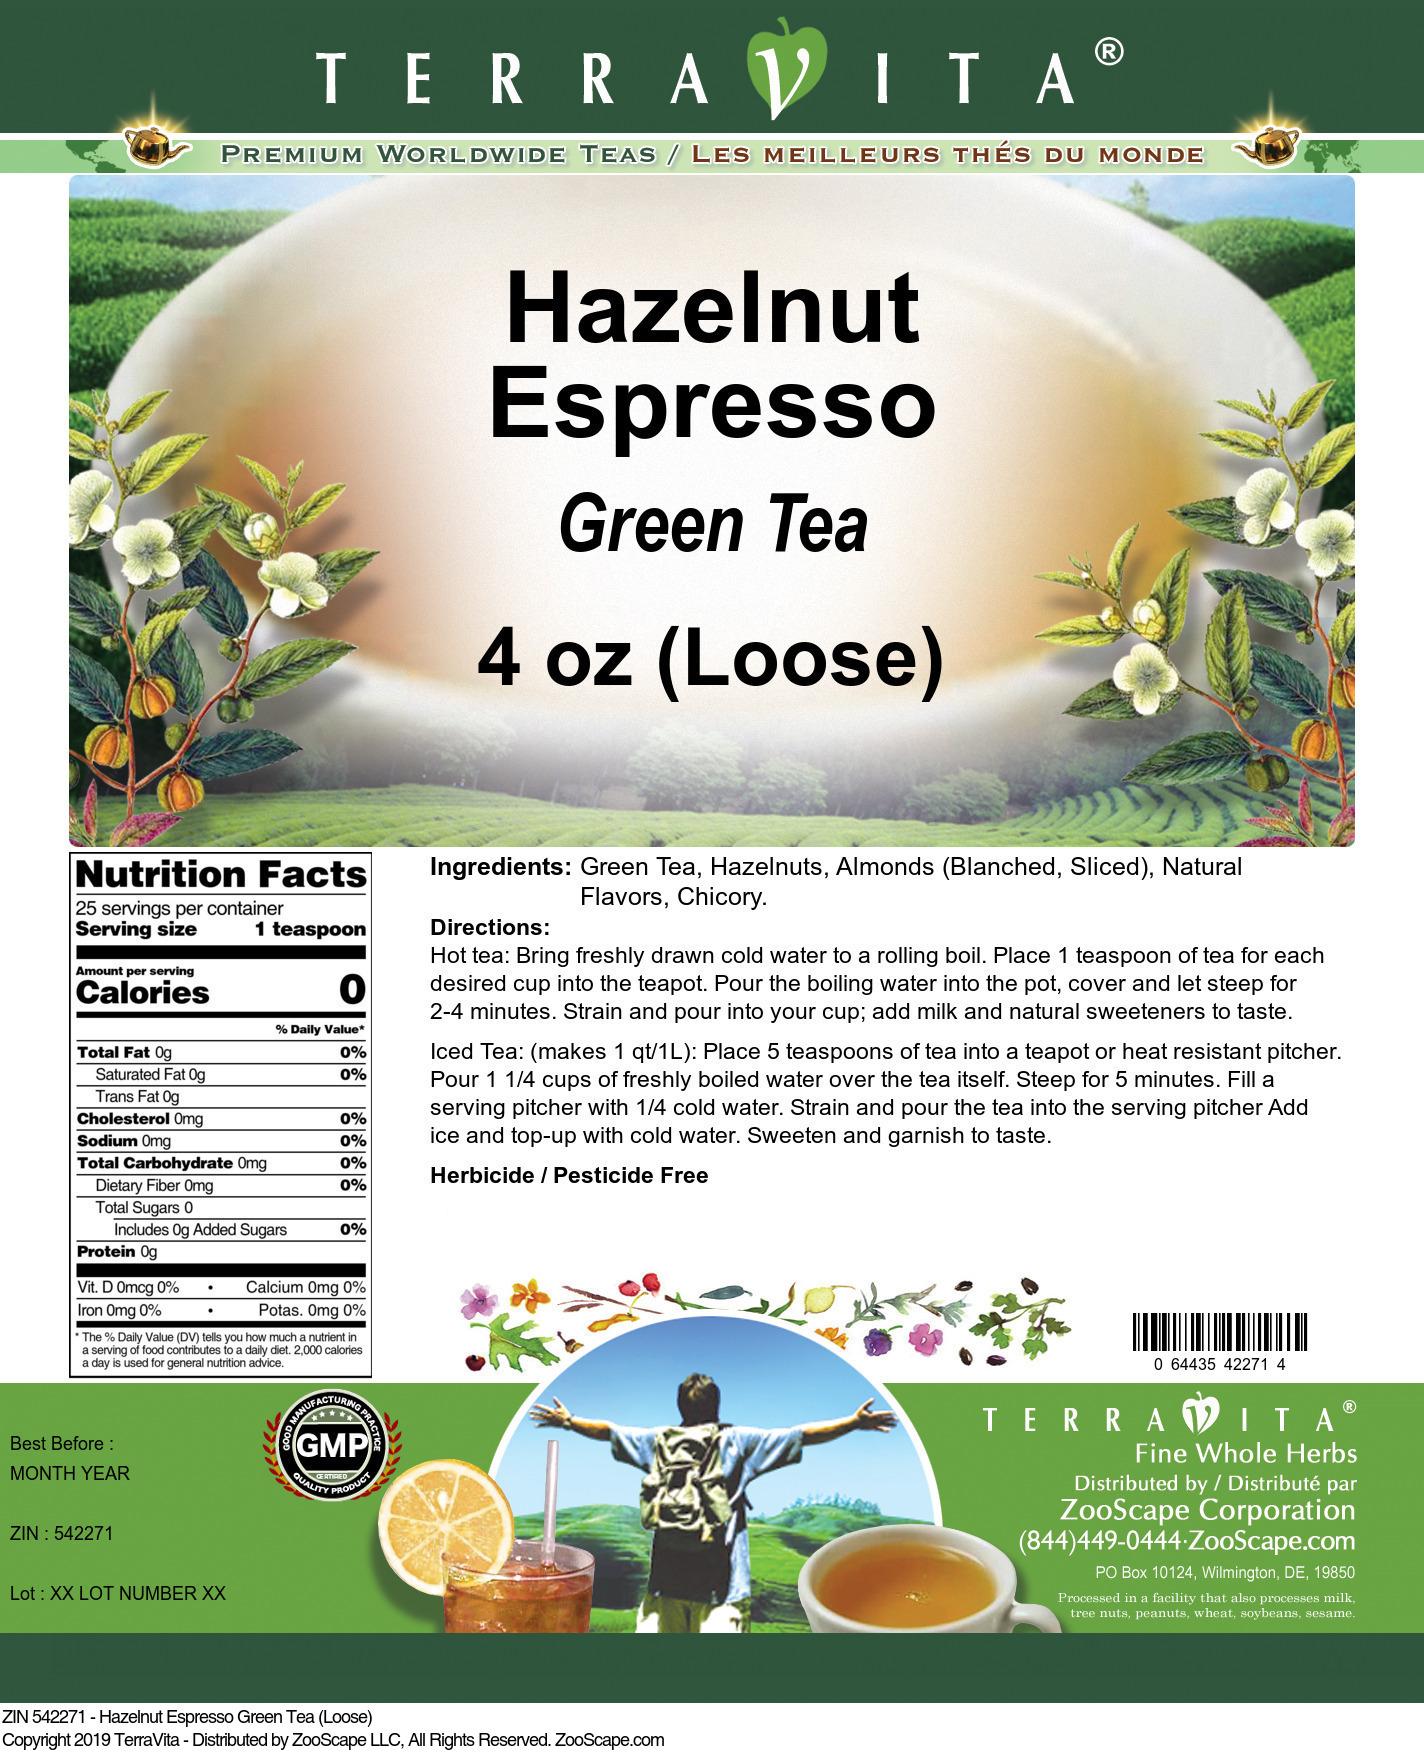 Hazelnut Espresso Green Tea (Loose)